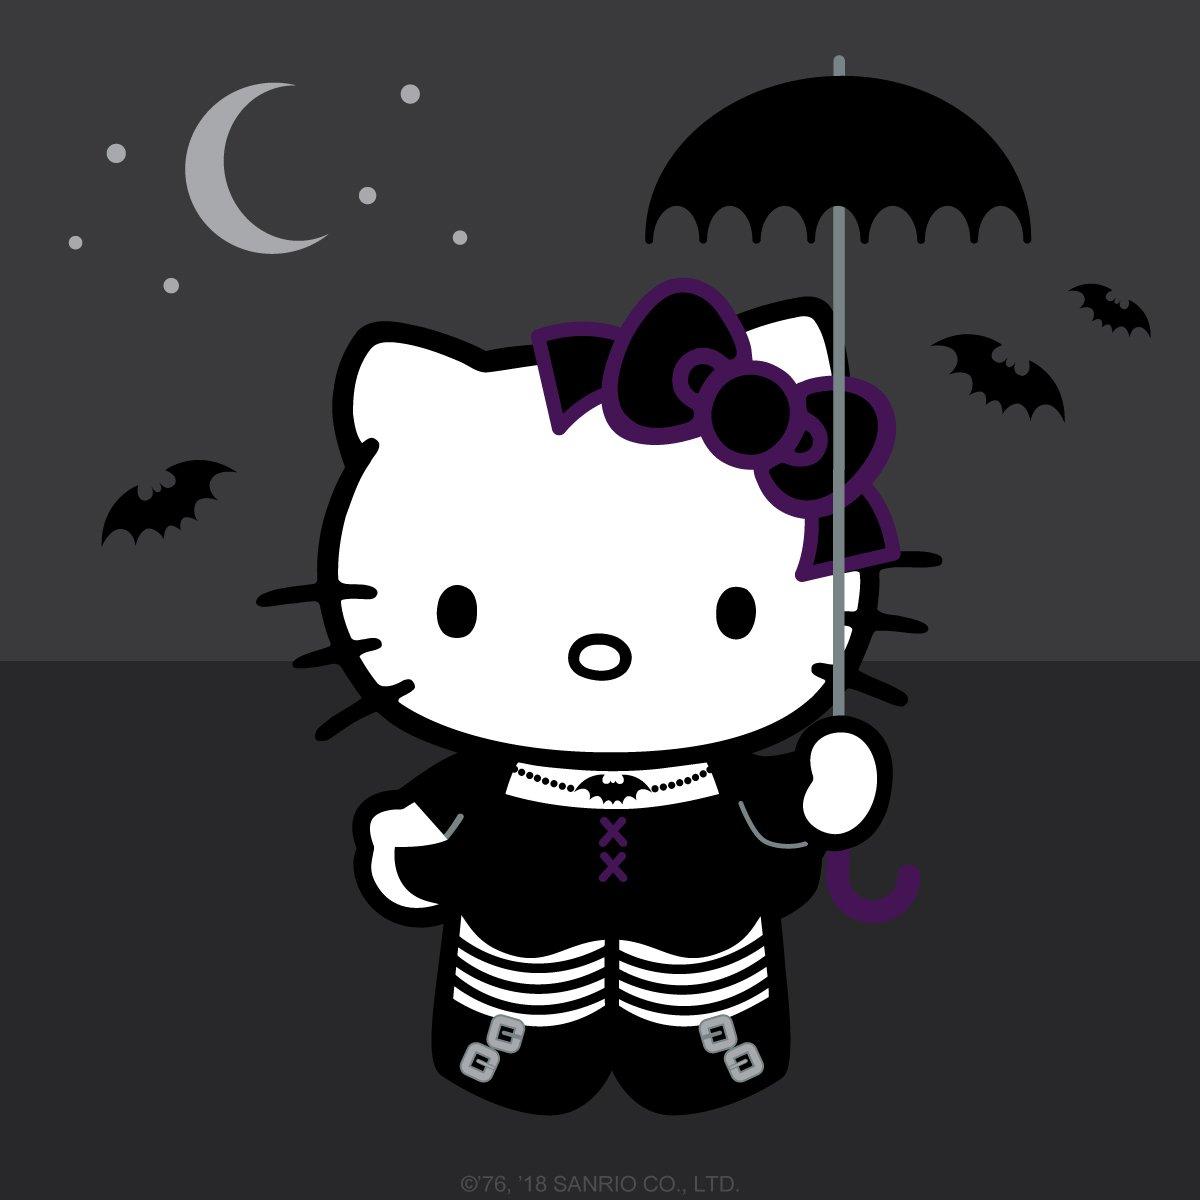 Celebrating in black fashion today! #WorldGothDay #HelloKitty